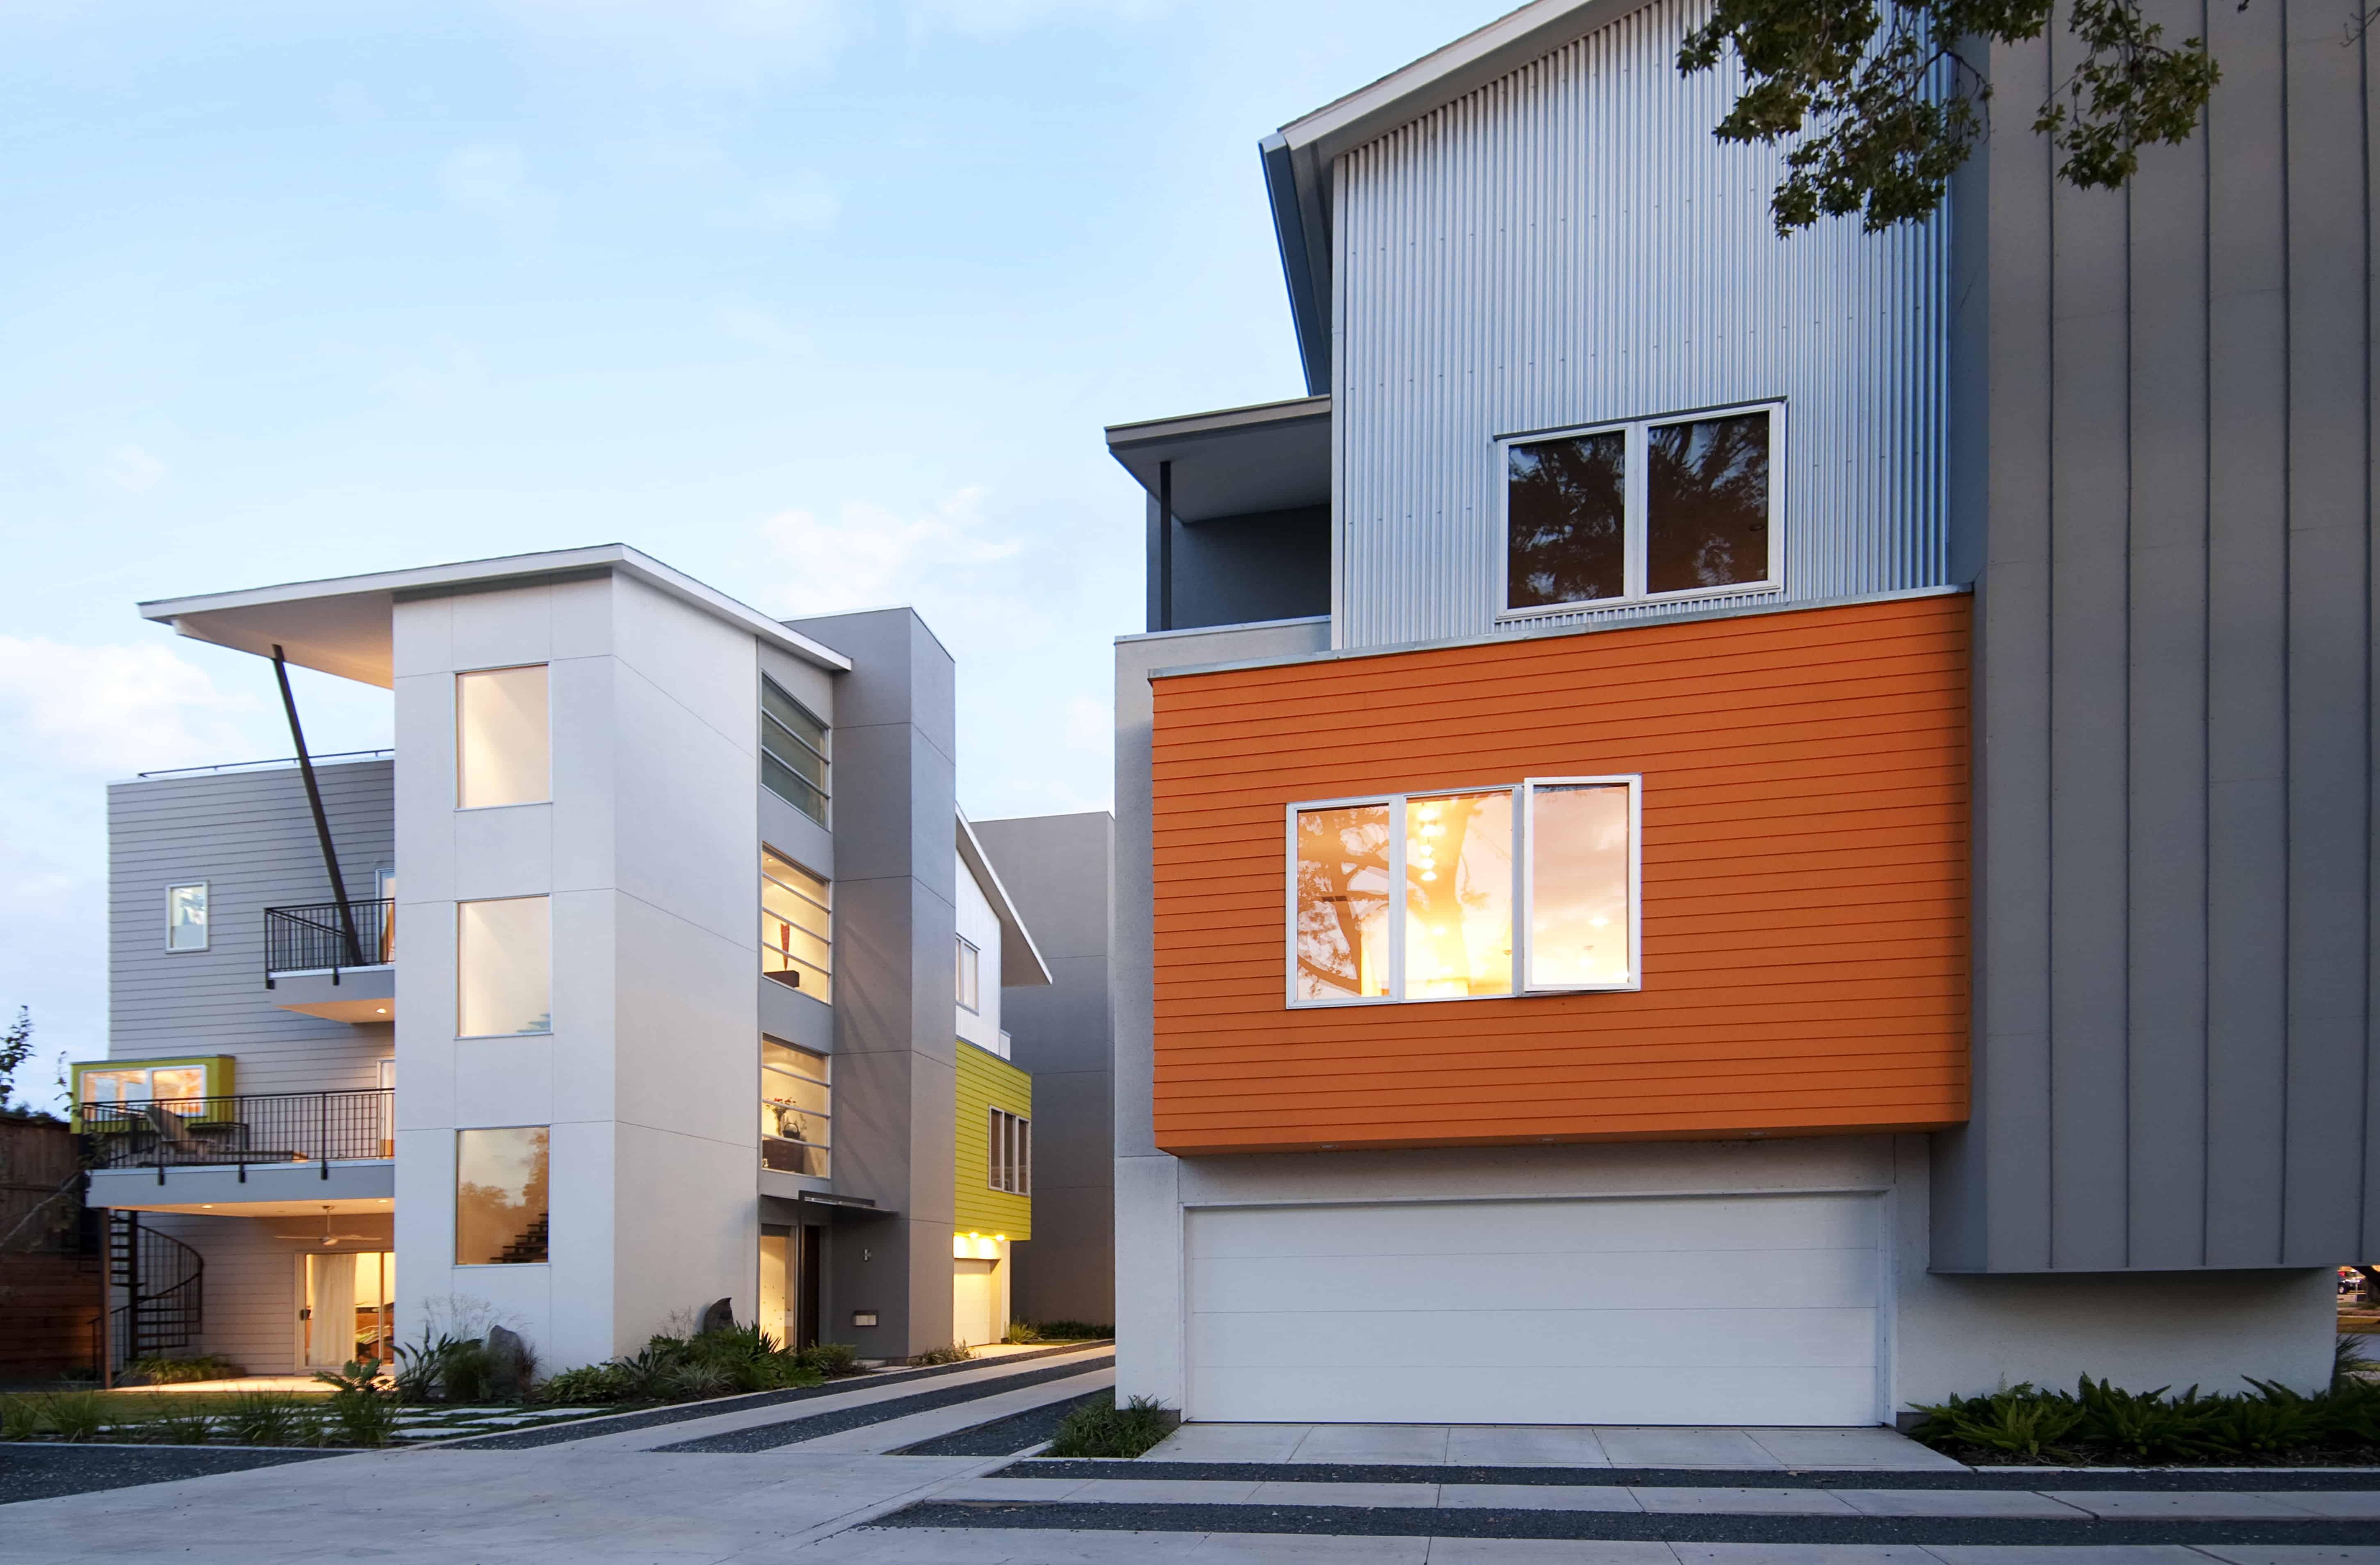 Southmore terrace sustainable house exterior facade.